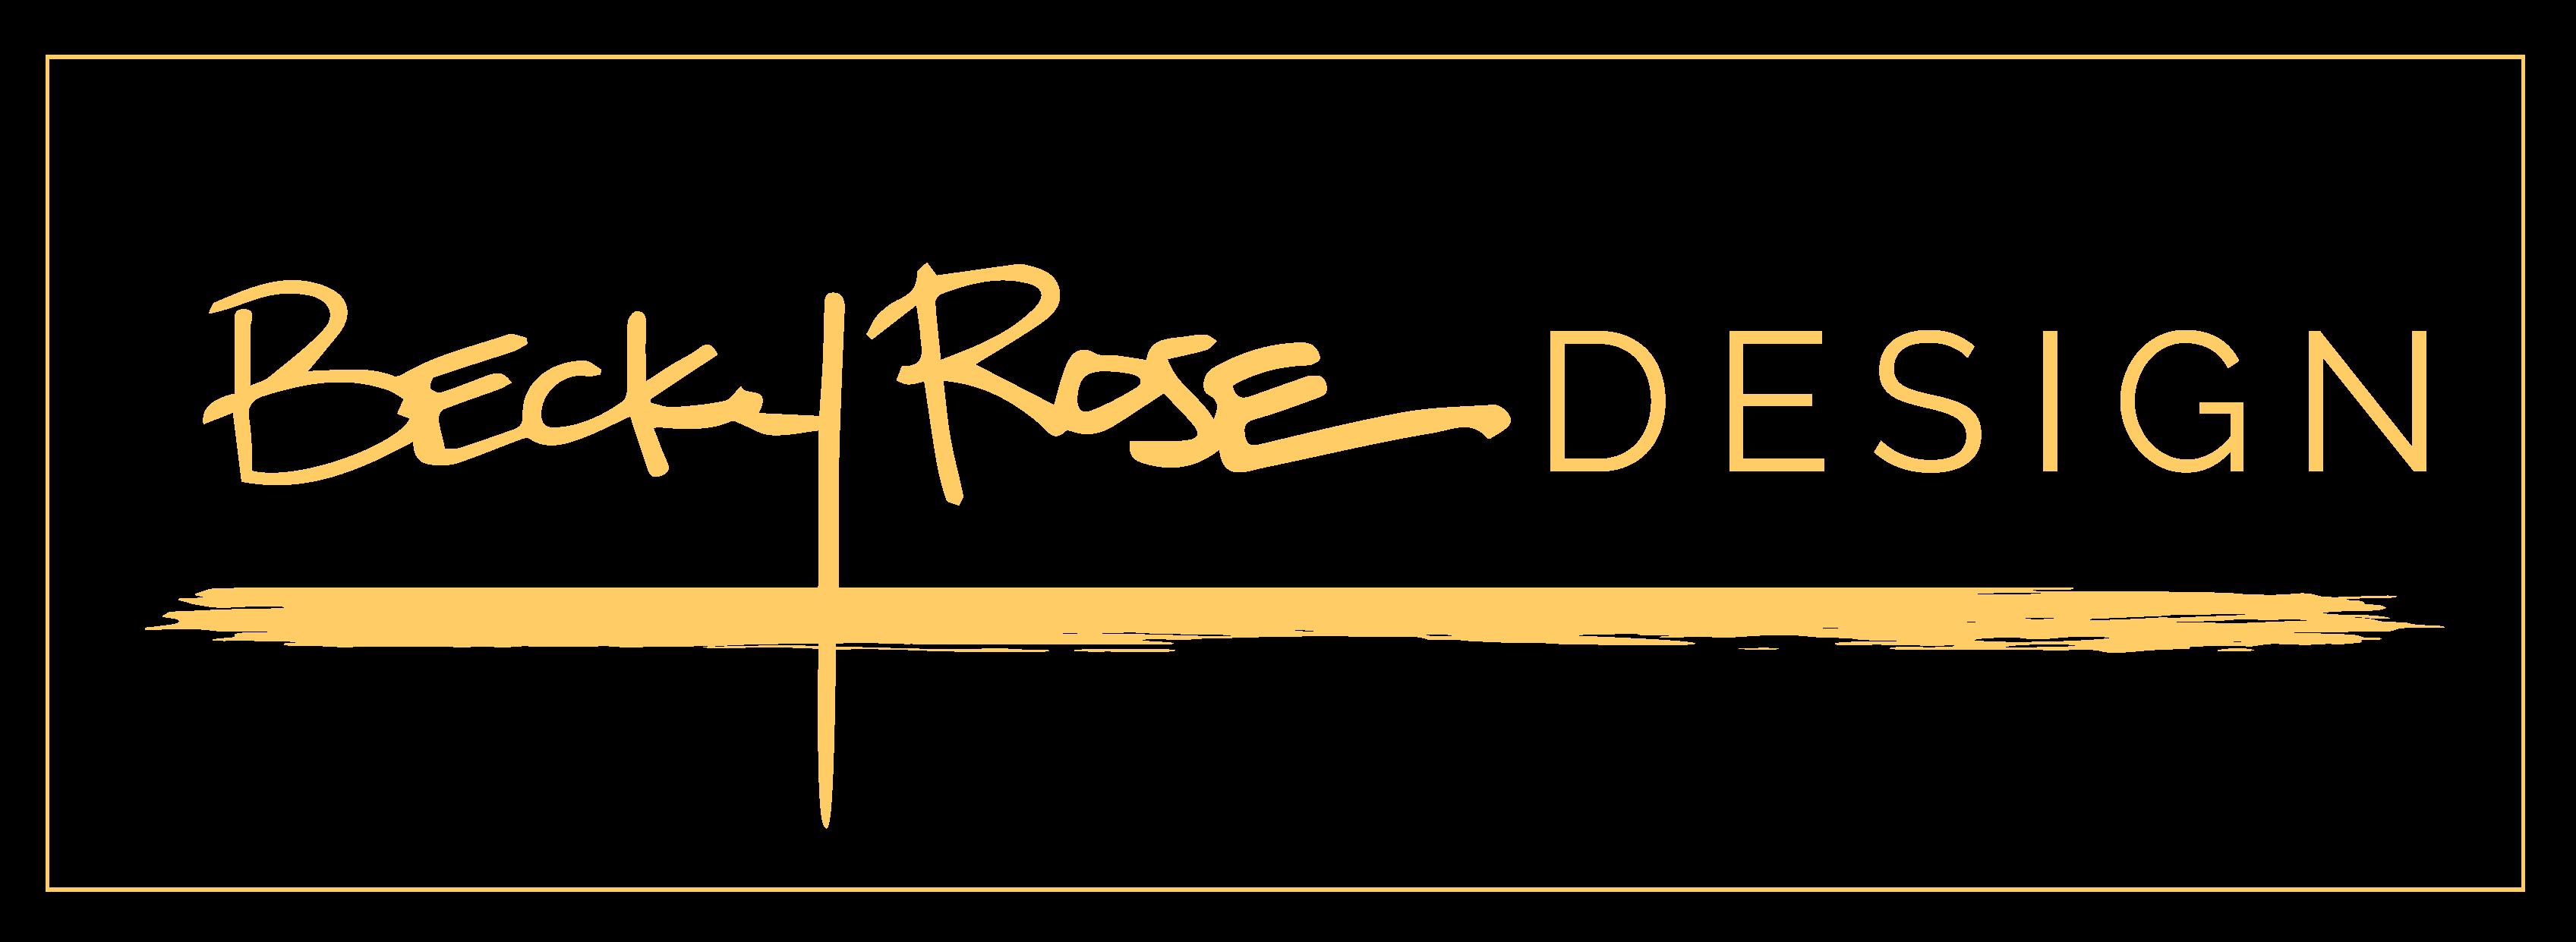 Becky Rose Design